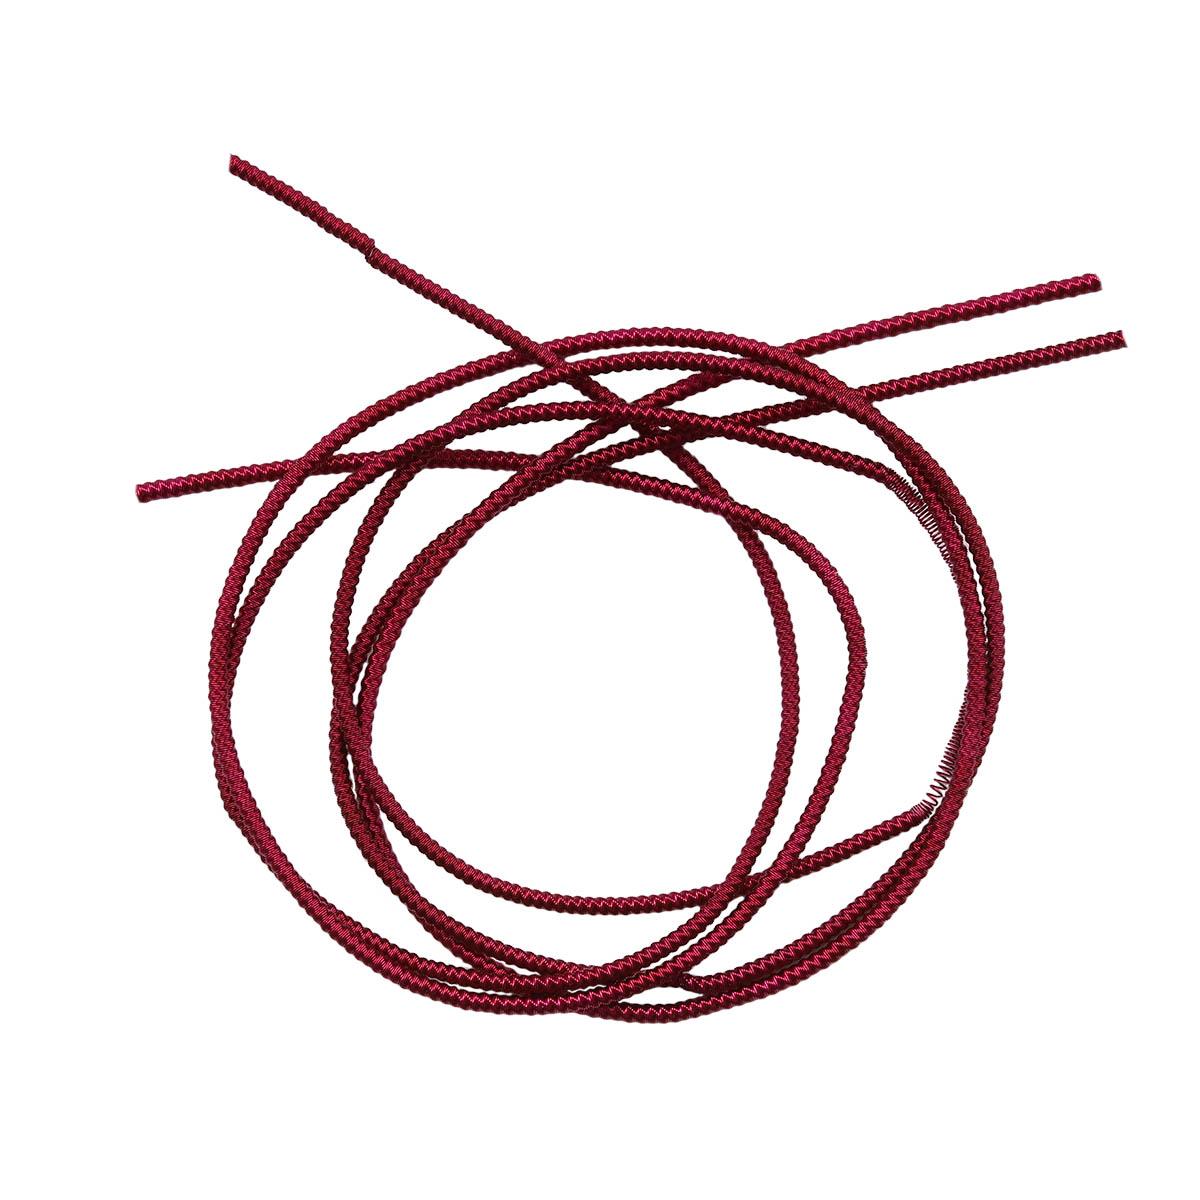 ТЗ011НН1 Трунцал зигзаг Вишневый 1,5 мм 5 гр, +/- 0,1 гр.